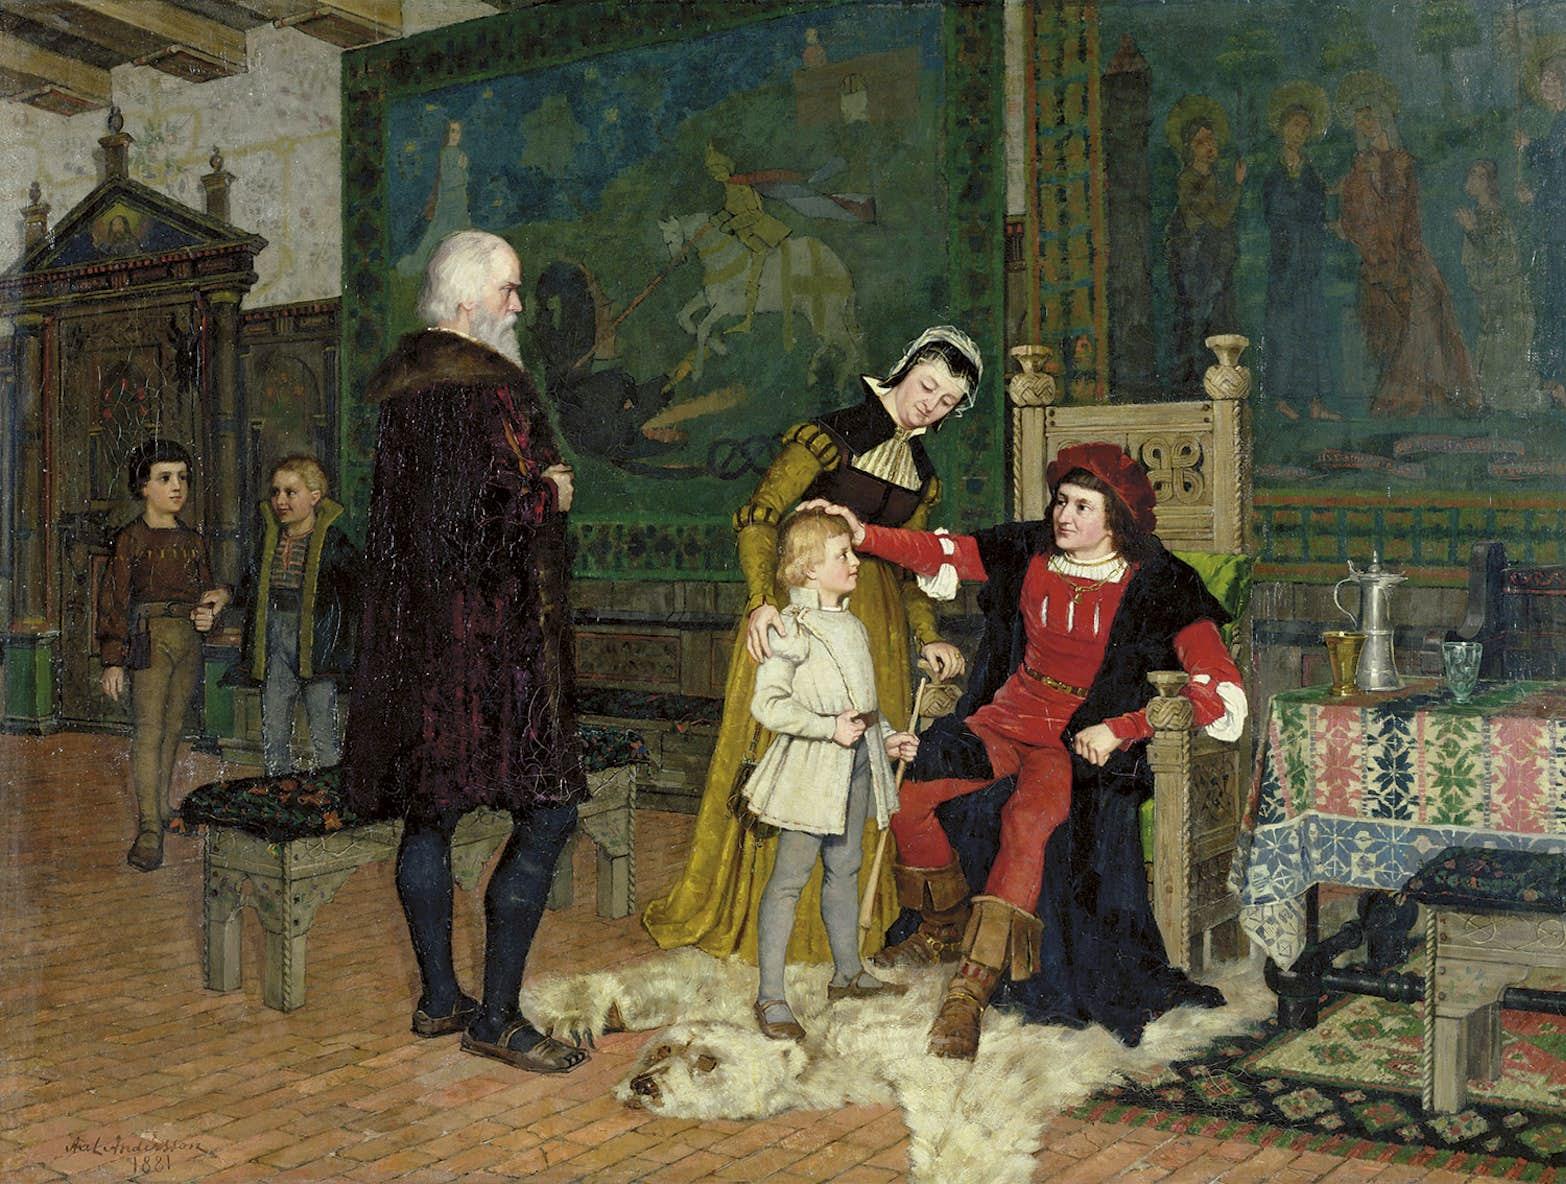 Gustav Vasa revoltren som byggde en nation